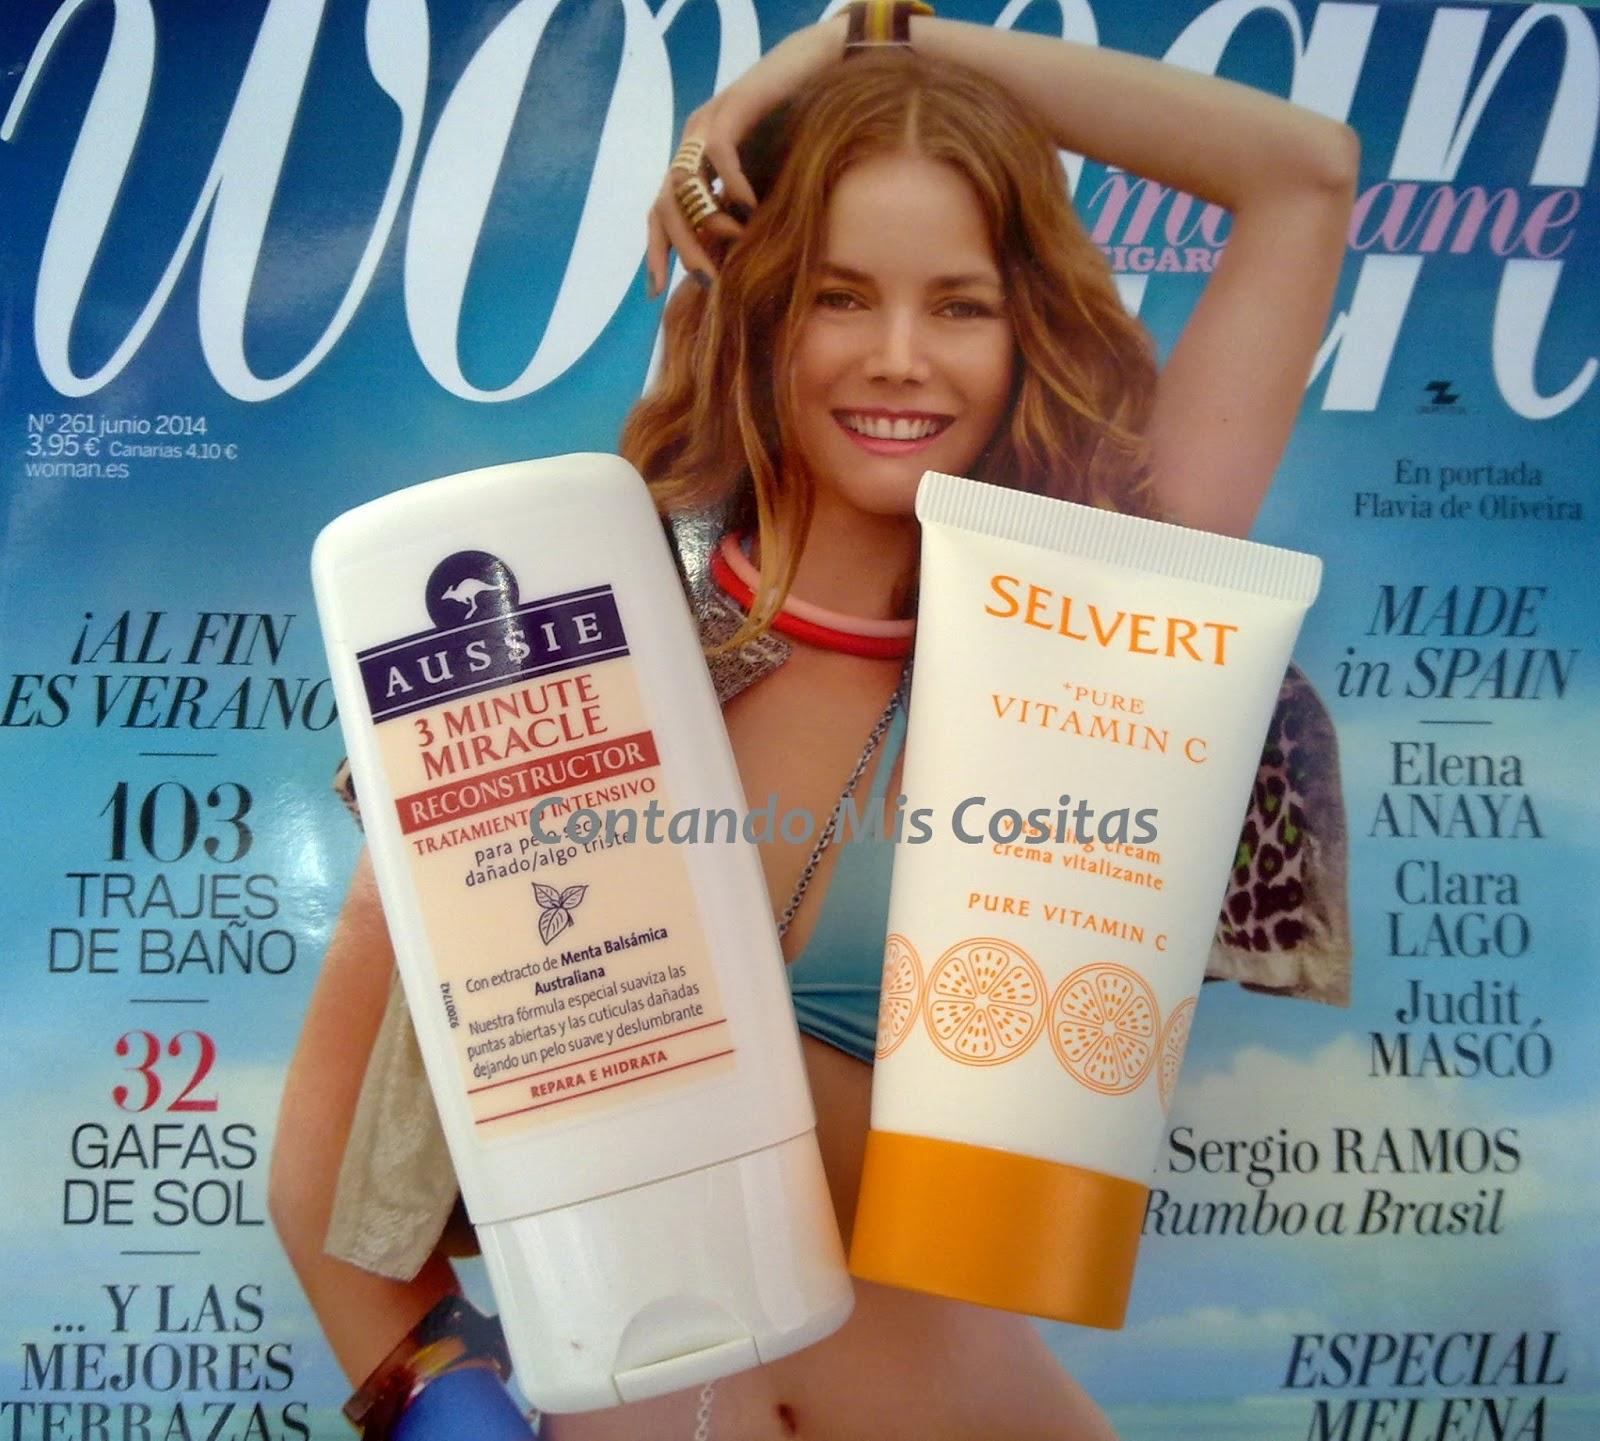 woman regalo crema selvert junio 2014